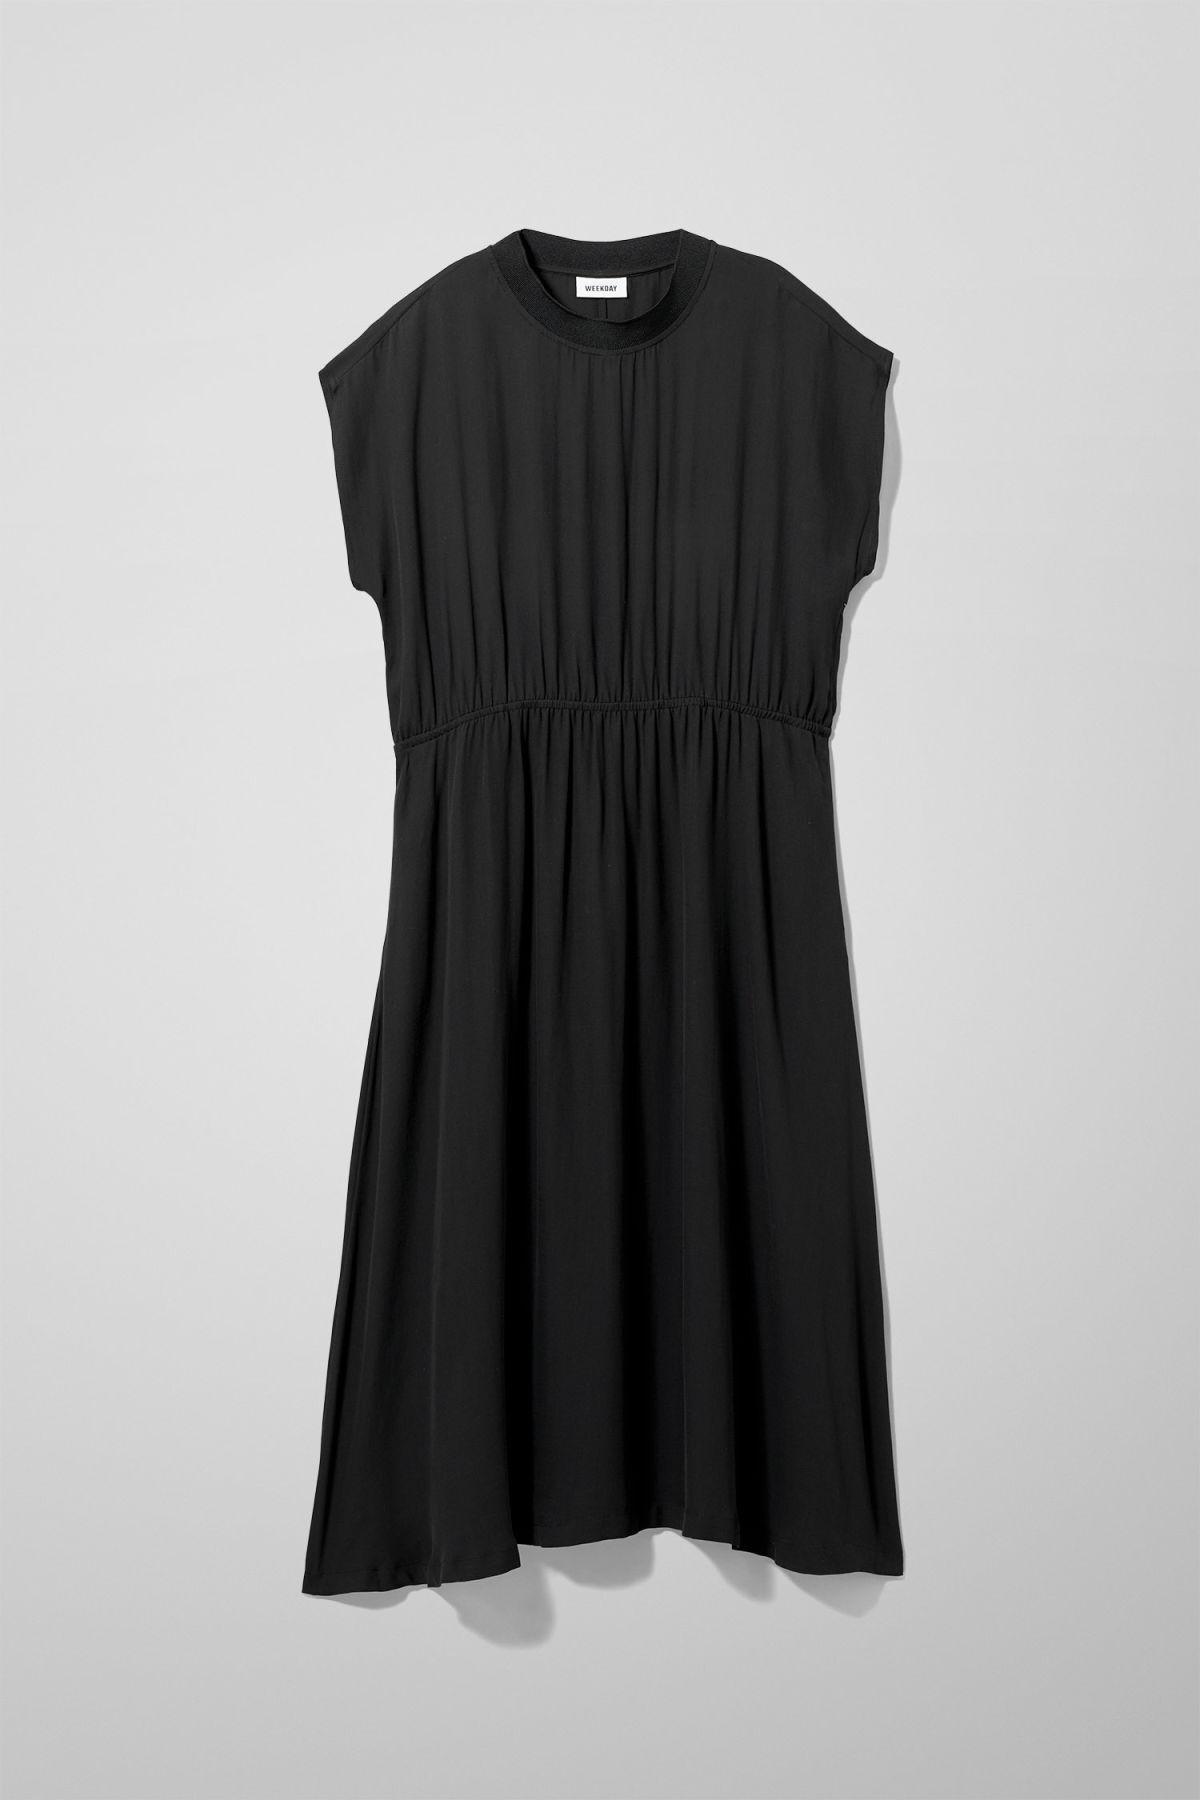 Image of Norma Dress - Black-M